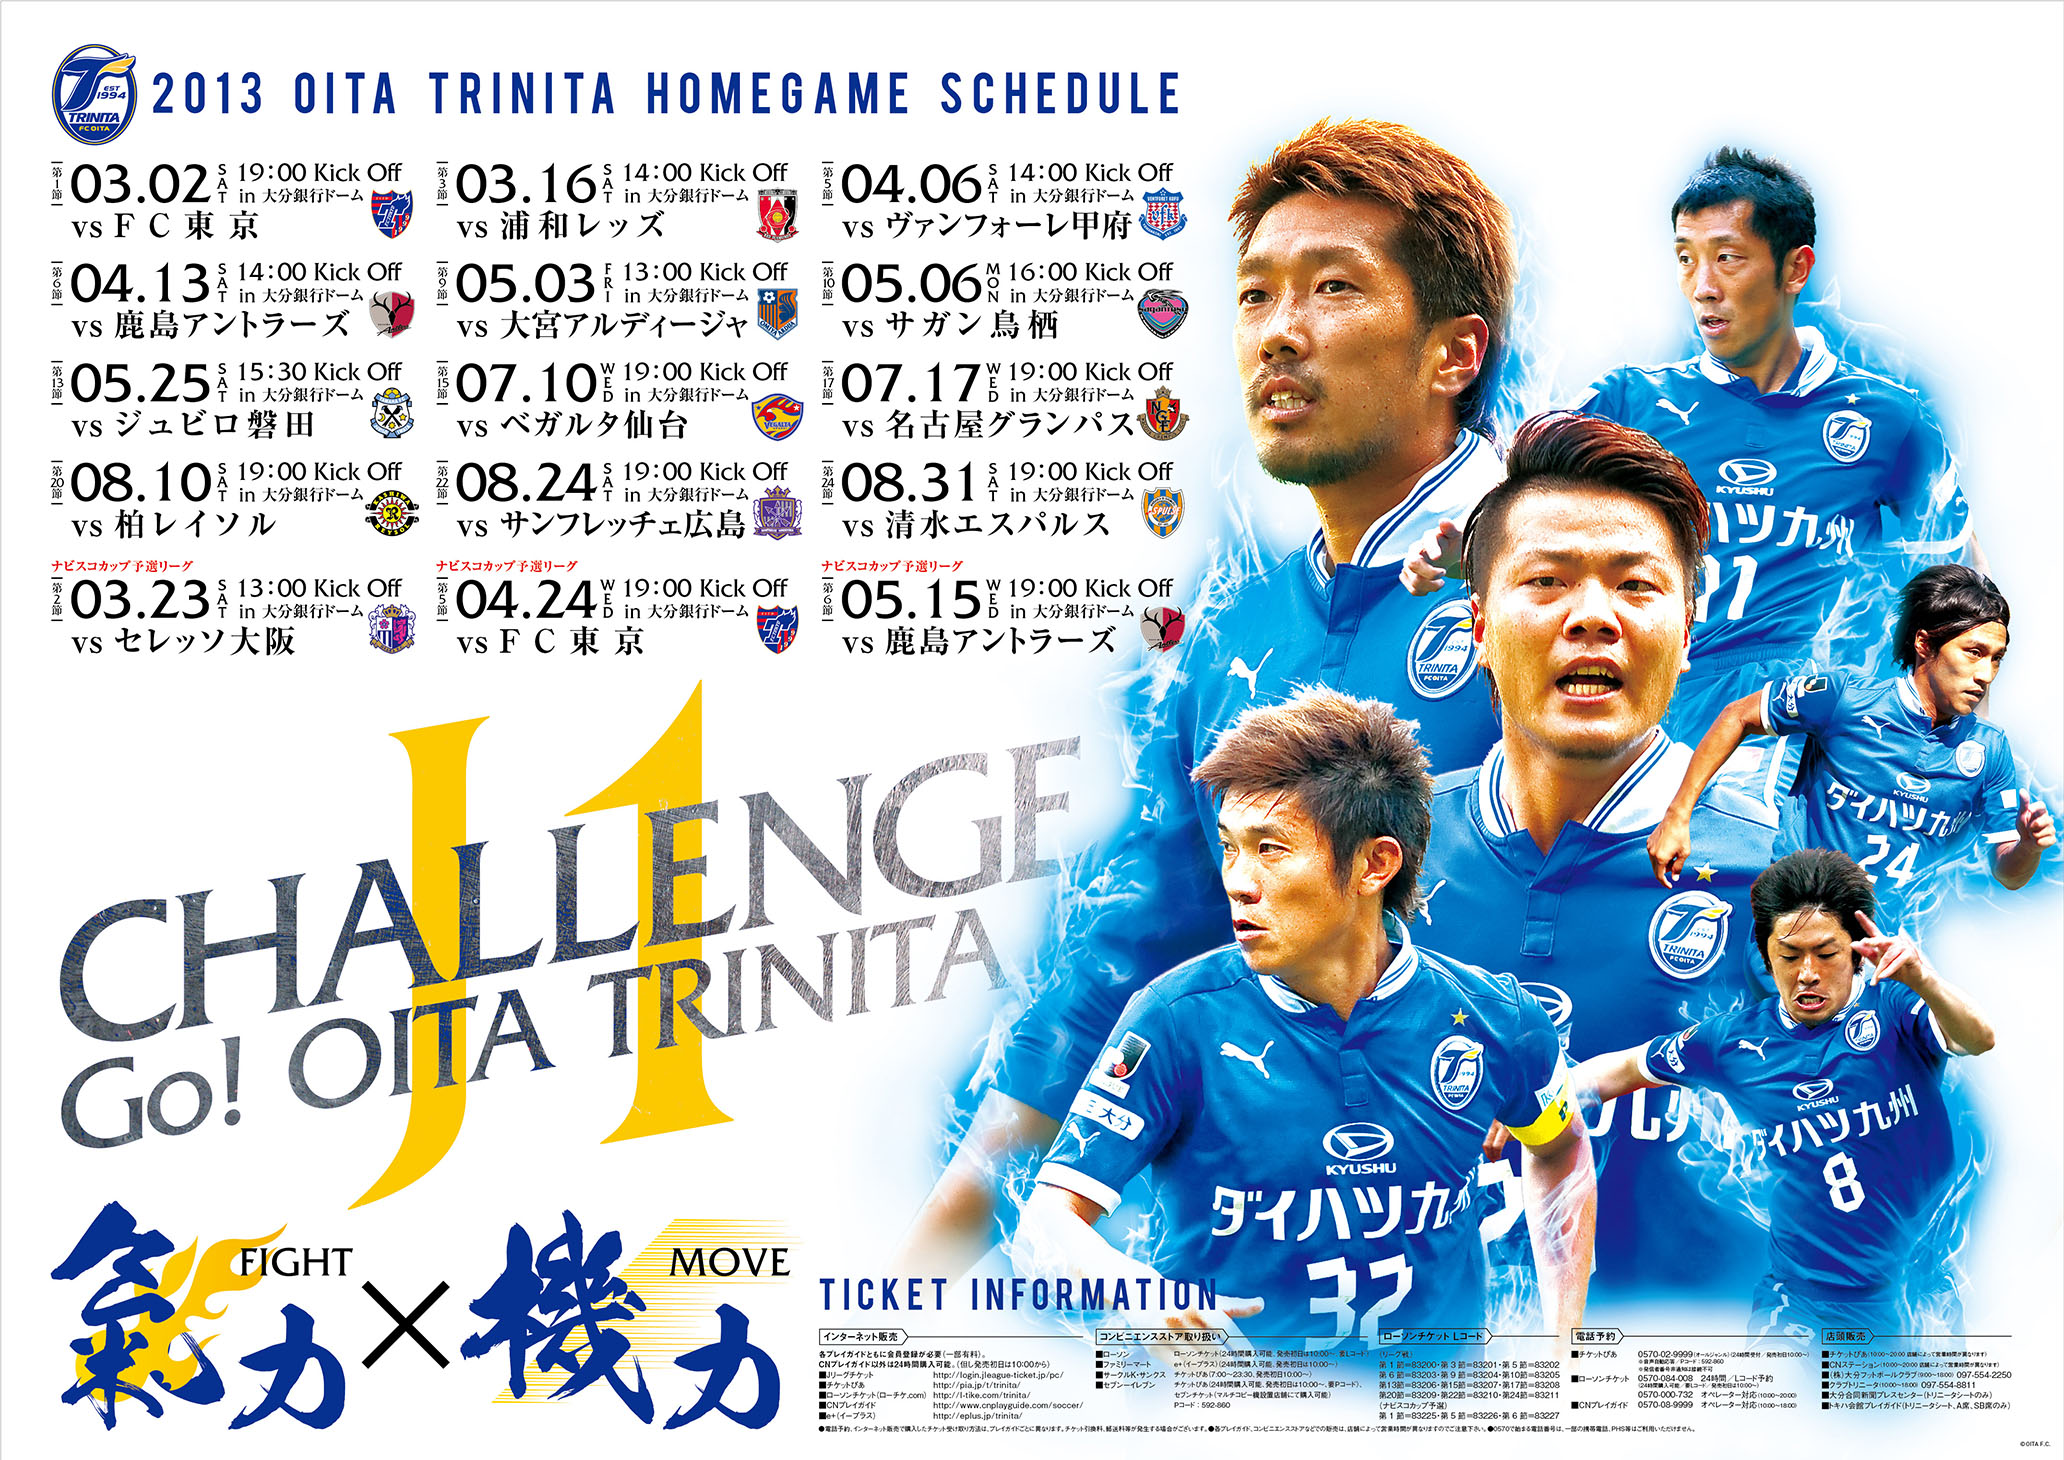 OITA TRINITA 2013前期試合日程ポスター